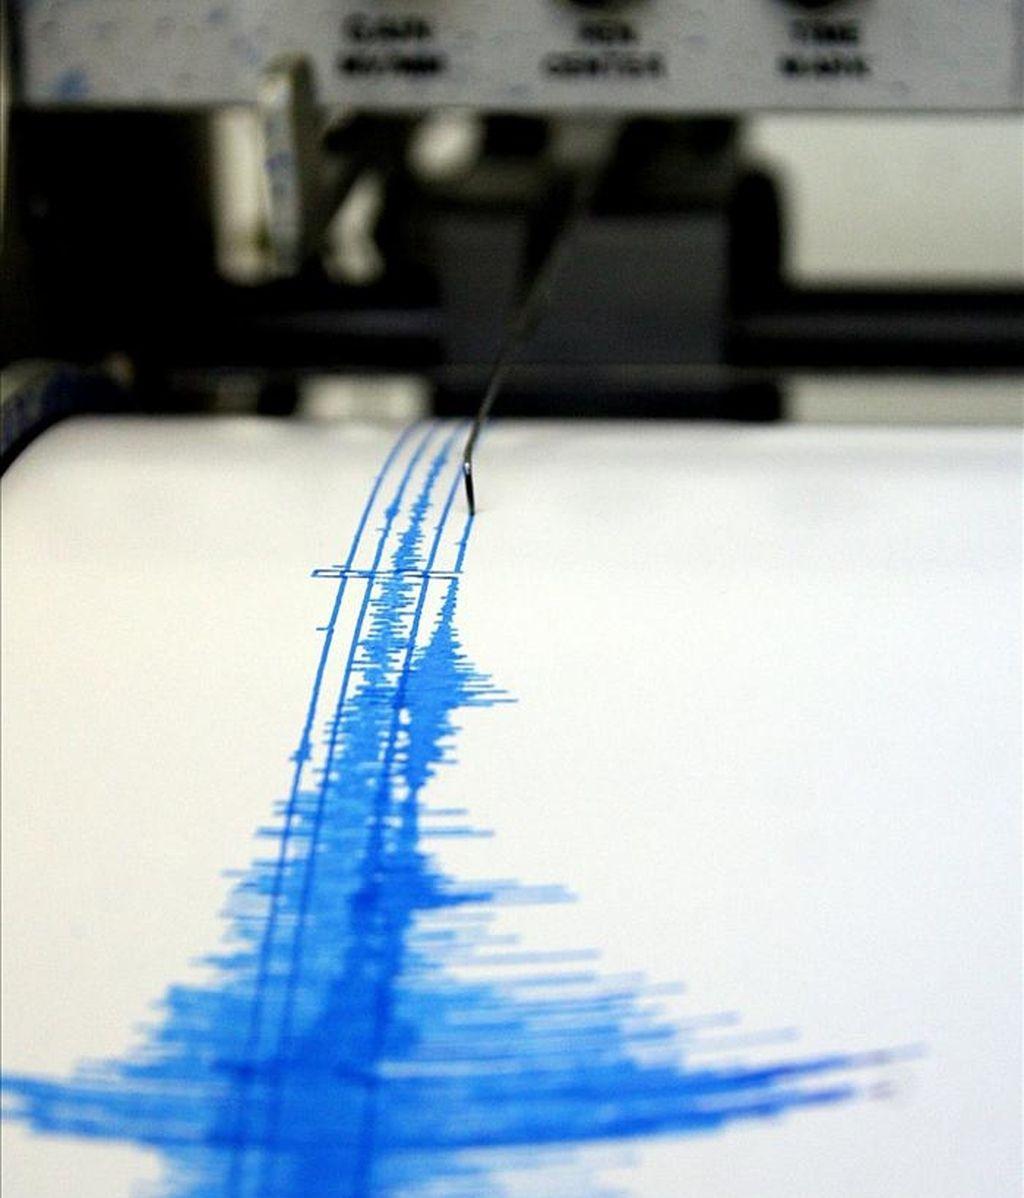 En la imagen, un sismógrafo. EFE/Archivo